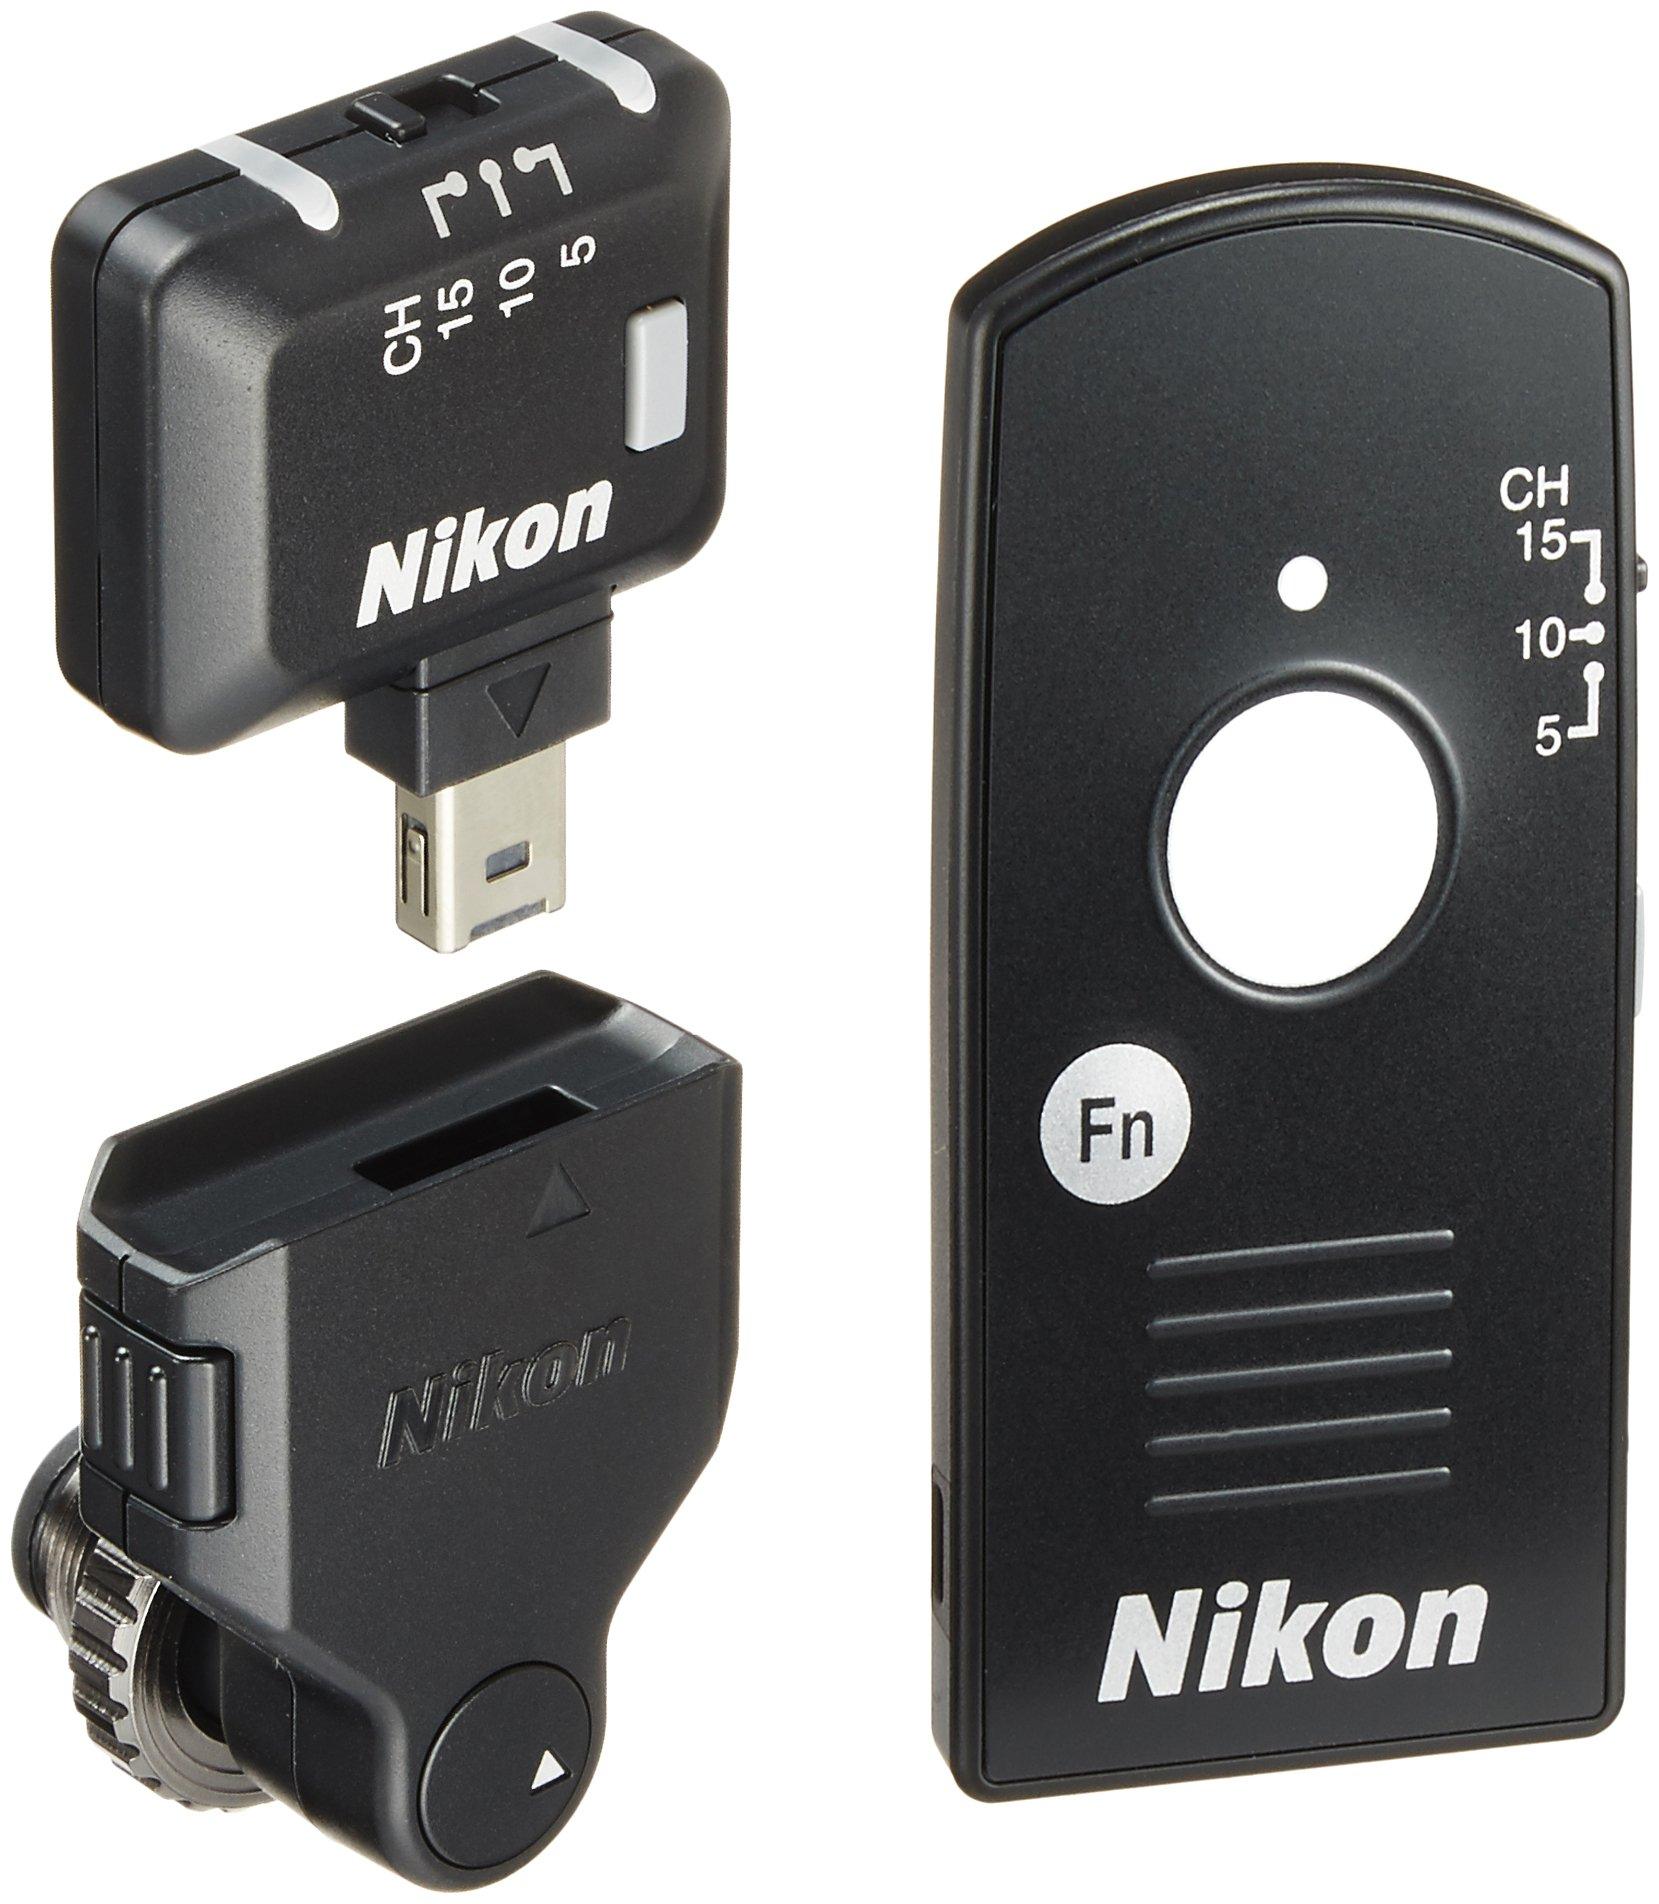 Nikon ワイヤレスリモートコントローラーセット WR-10 product image